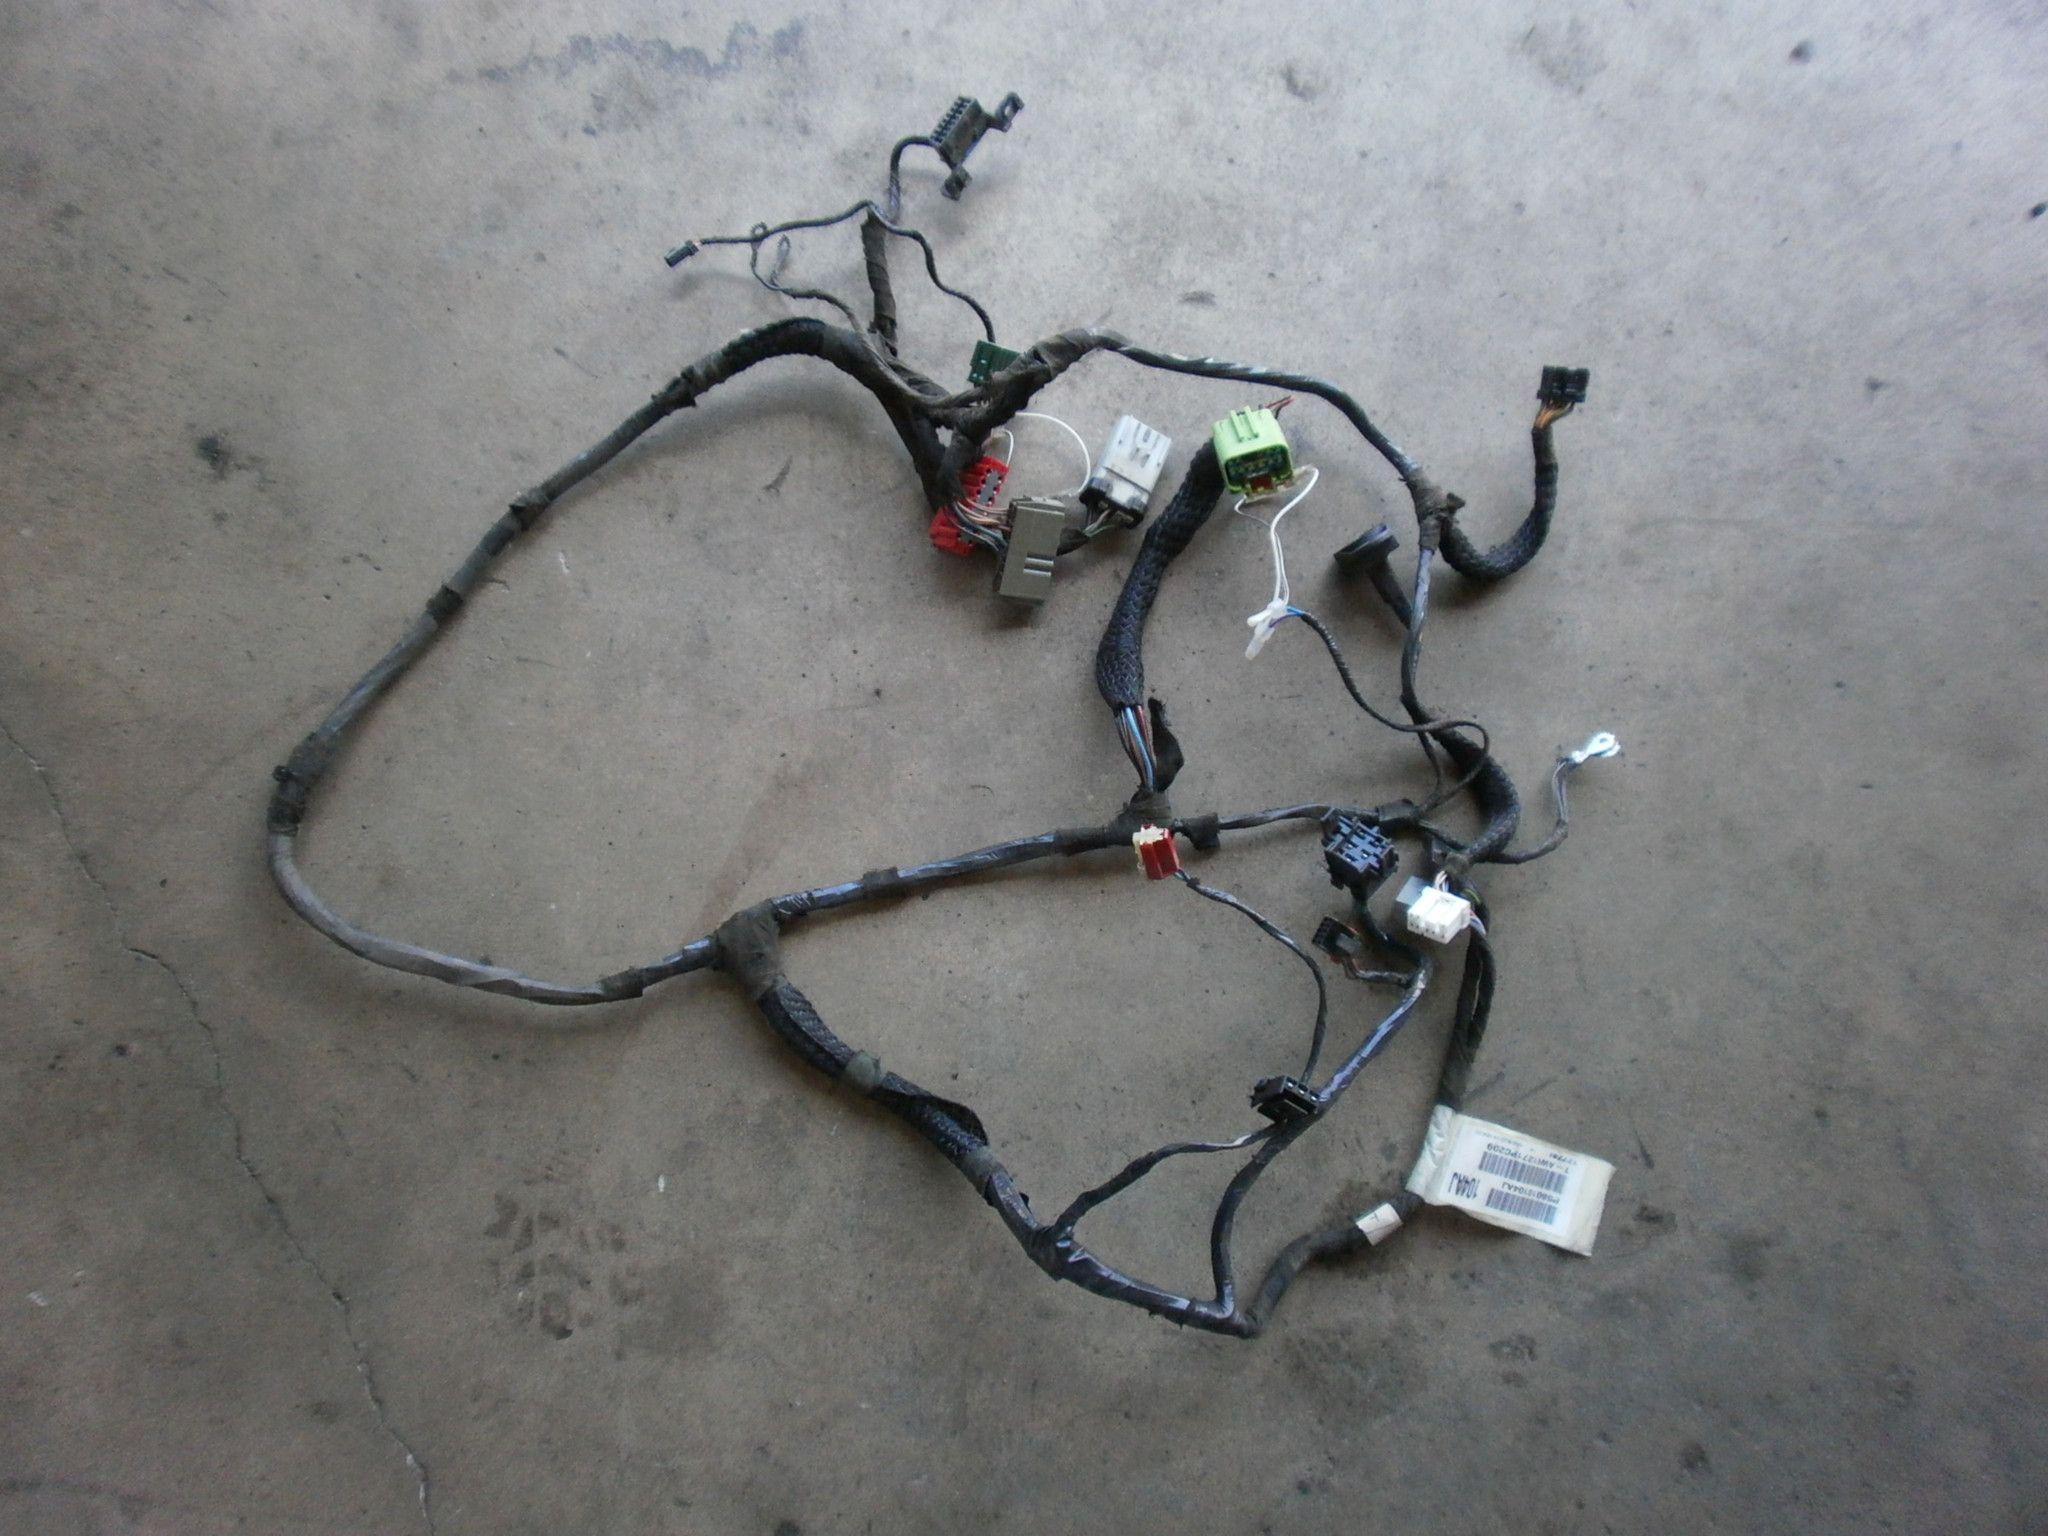 jeep wrangler tj instrument panel wiring harness 2001 p56010104aj oem good  used 2.4 4.0 | jeep wrangler tj, jeep wrangler, wrangler tj  pinterest